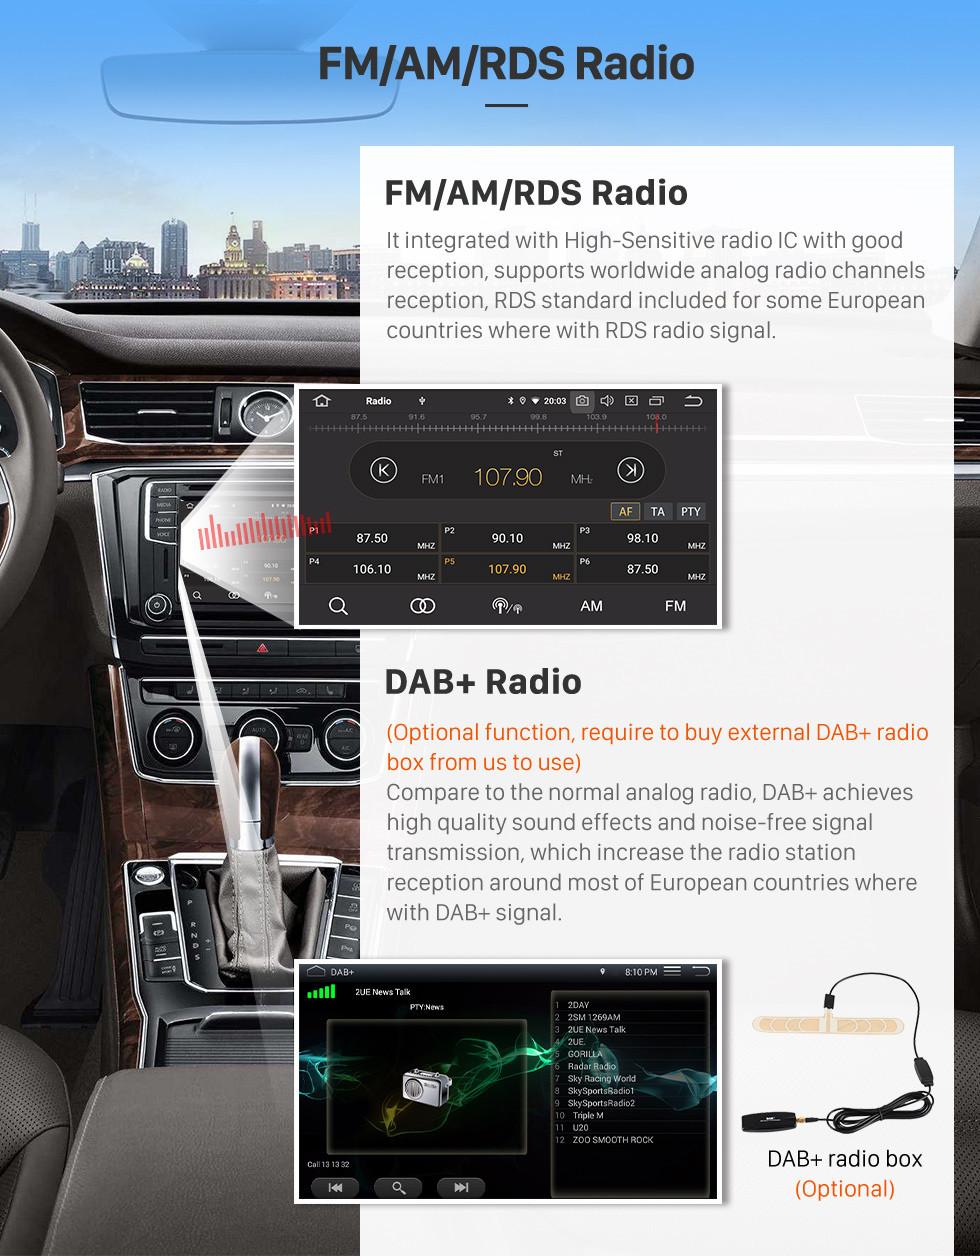 Seicane Pantalla táctil HD 2015-2017 Proton Myvi Android 9.0 9 pulgadas Navegación GPS Radio Bluetooth WIFI AUX USB Carplay compatible con DAB + DVR OBD2